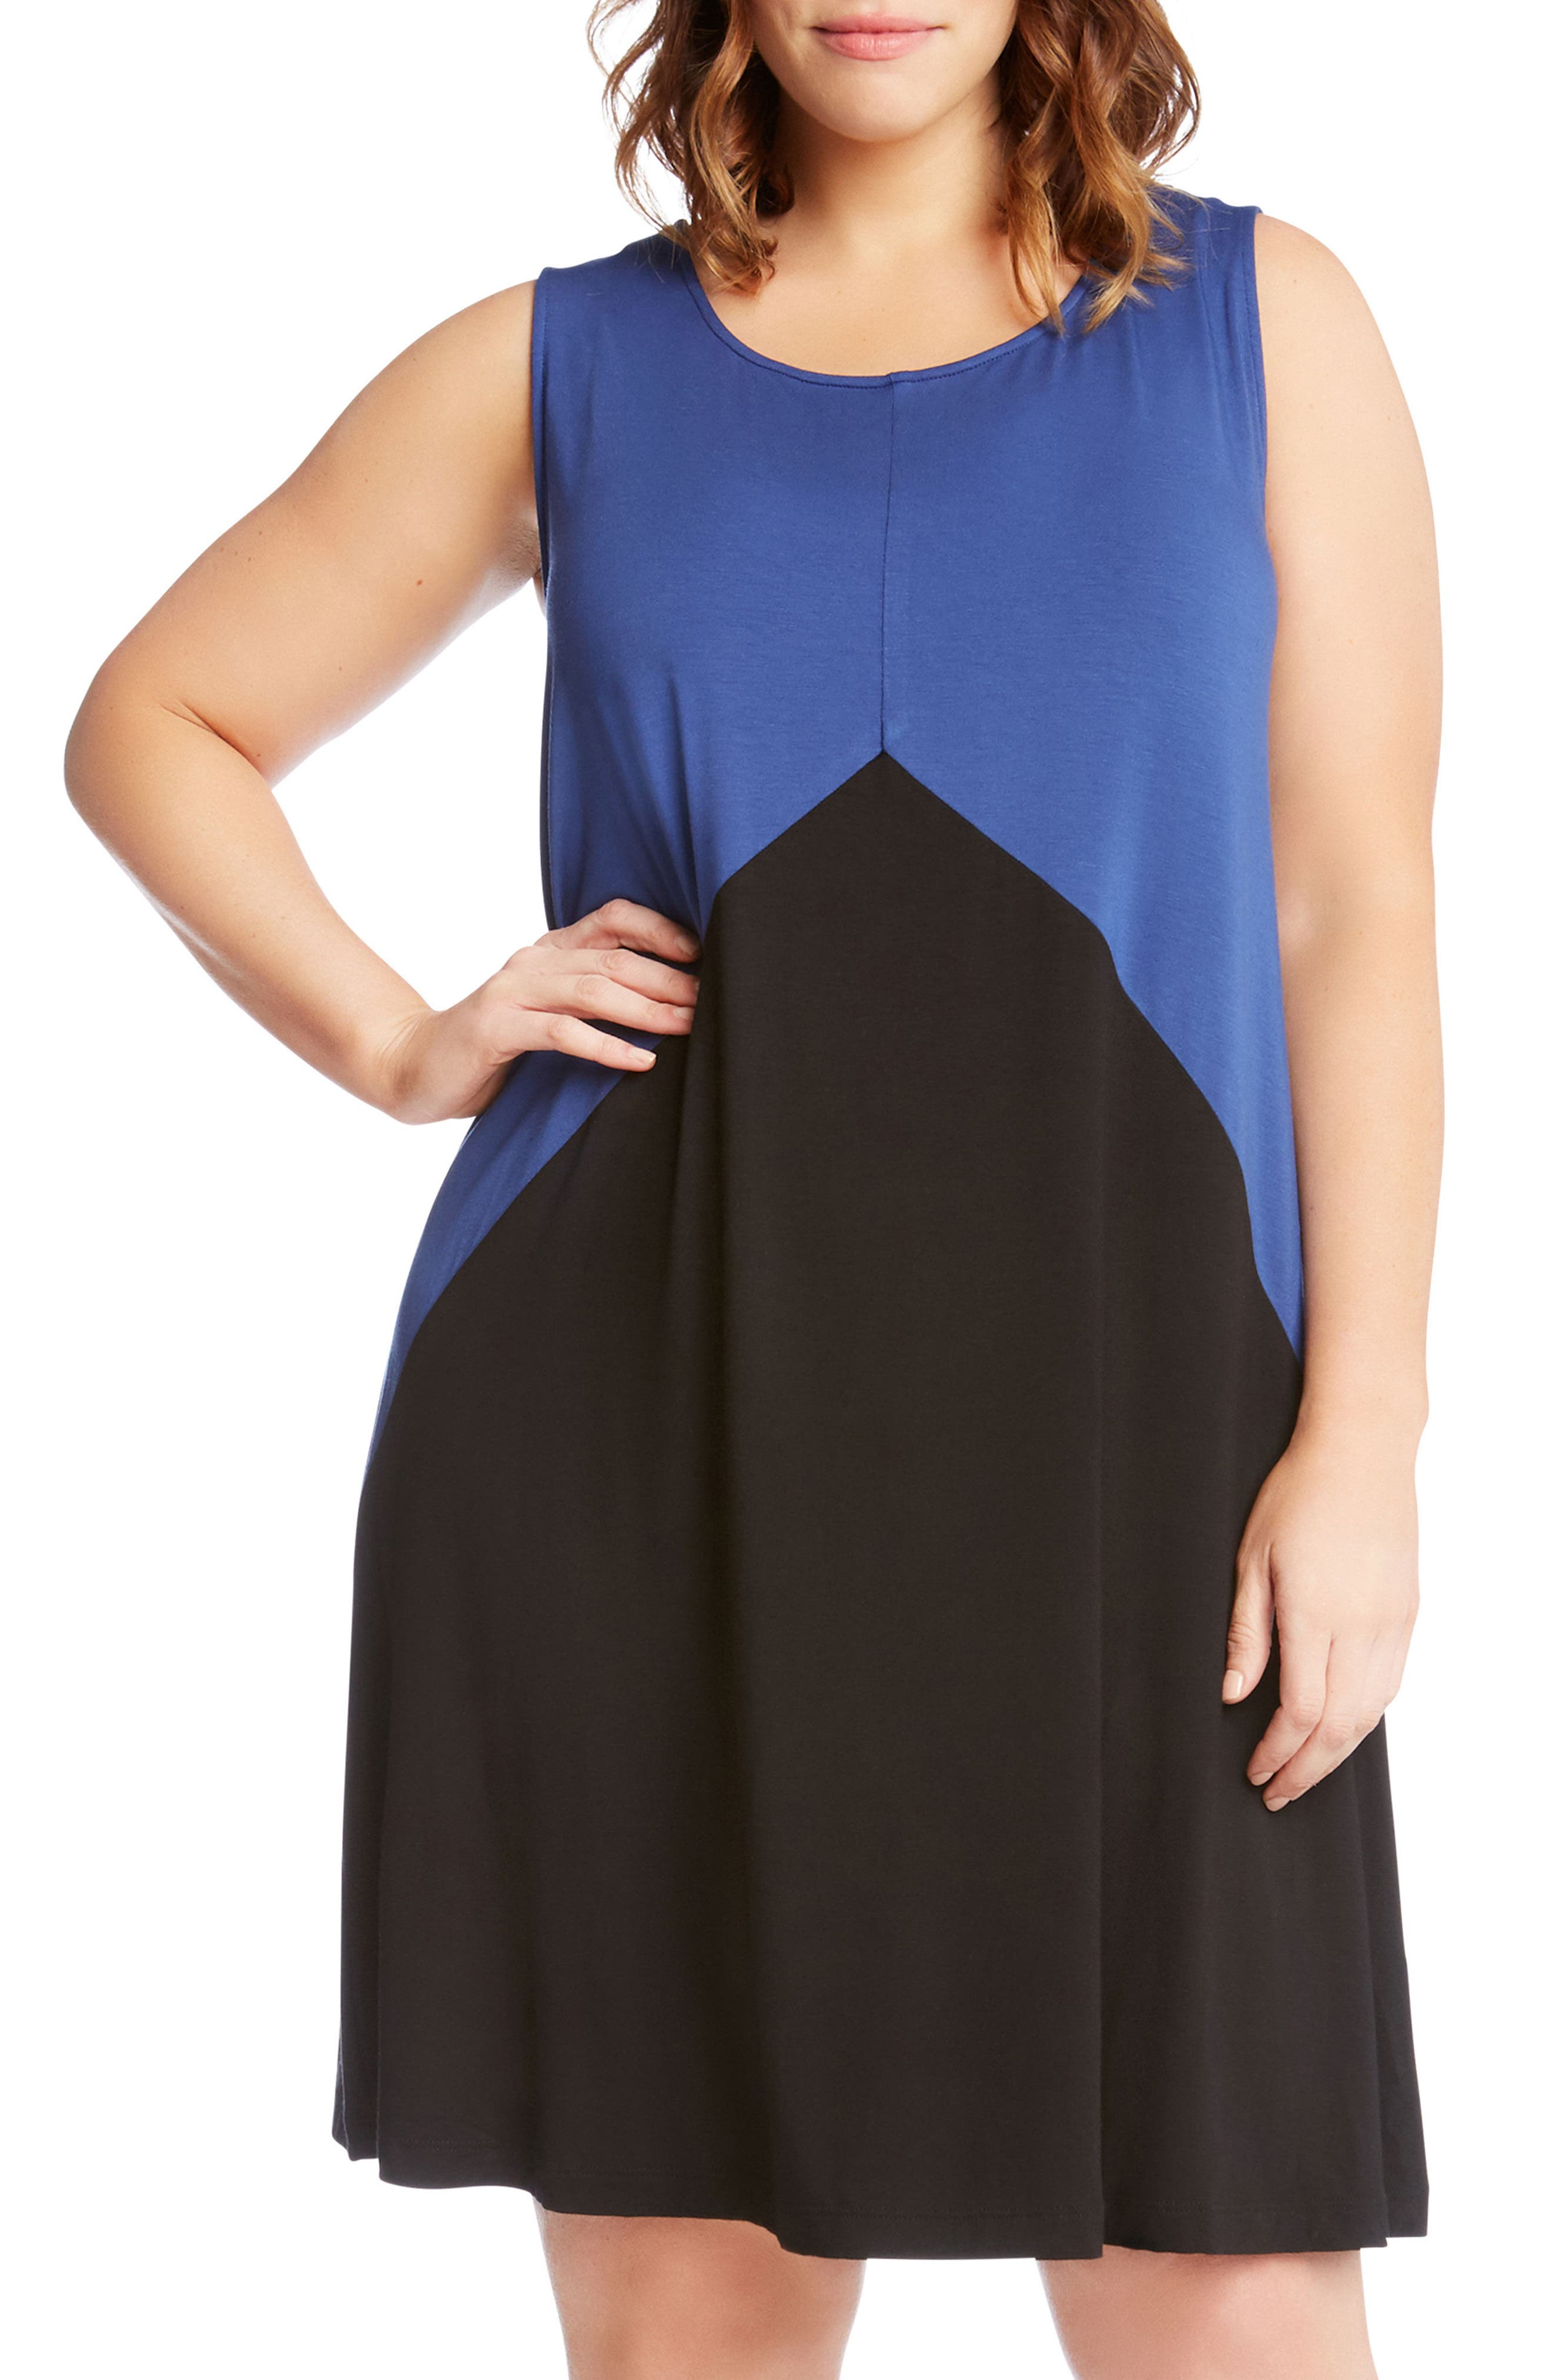 Colorblock Shift Dress,                             Alternate thumbnail 3, color,                             Blue With Black